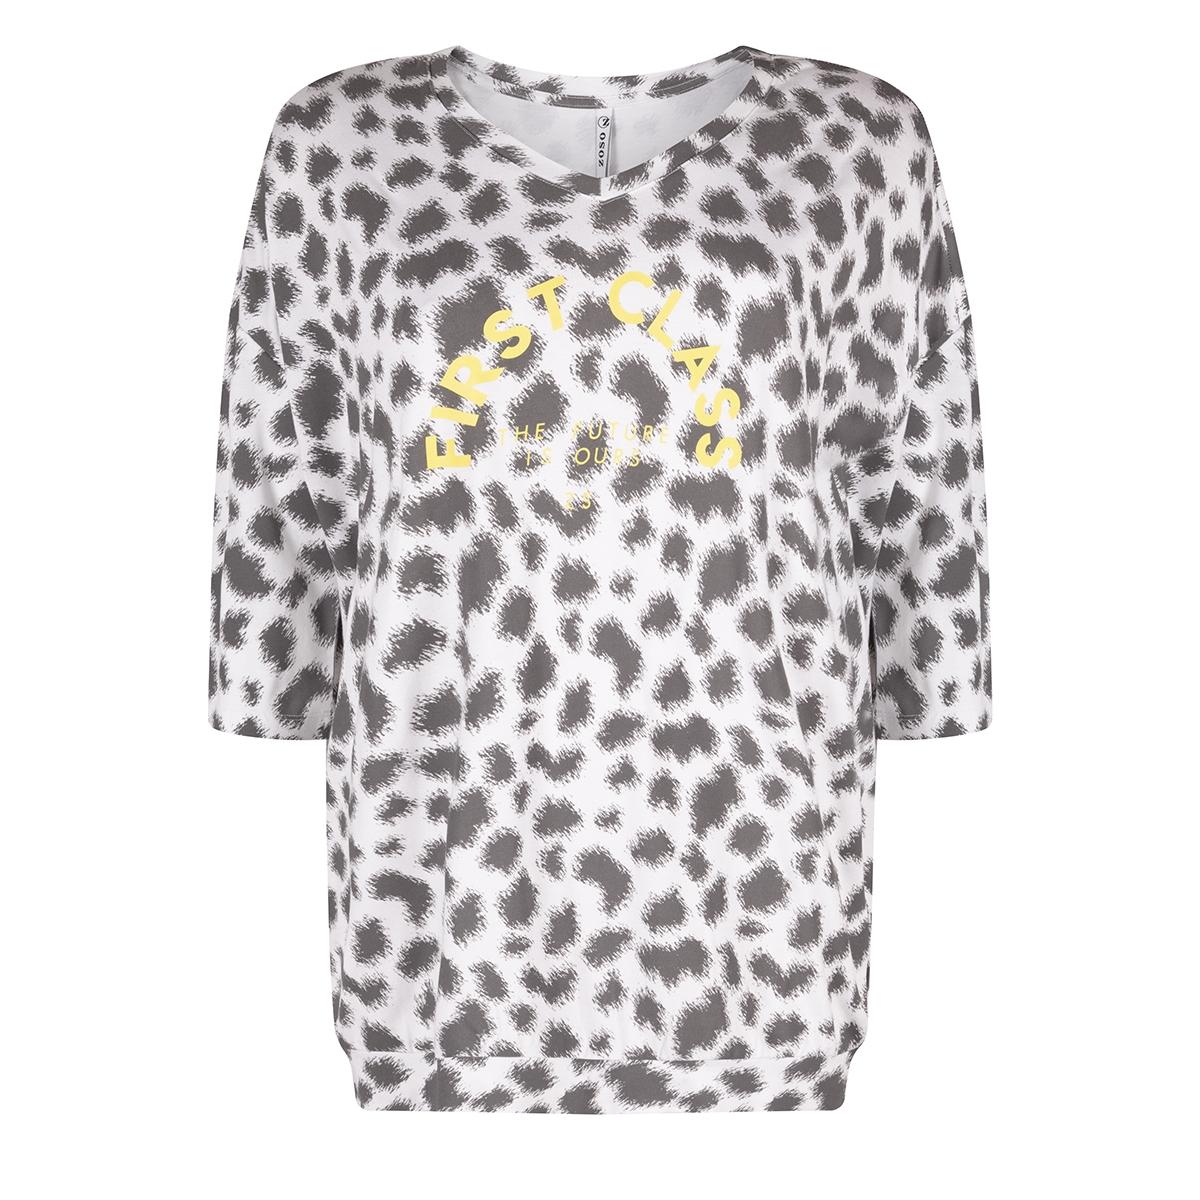 aliya printed t shirt 192 zoso t-shirt grey/yellow